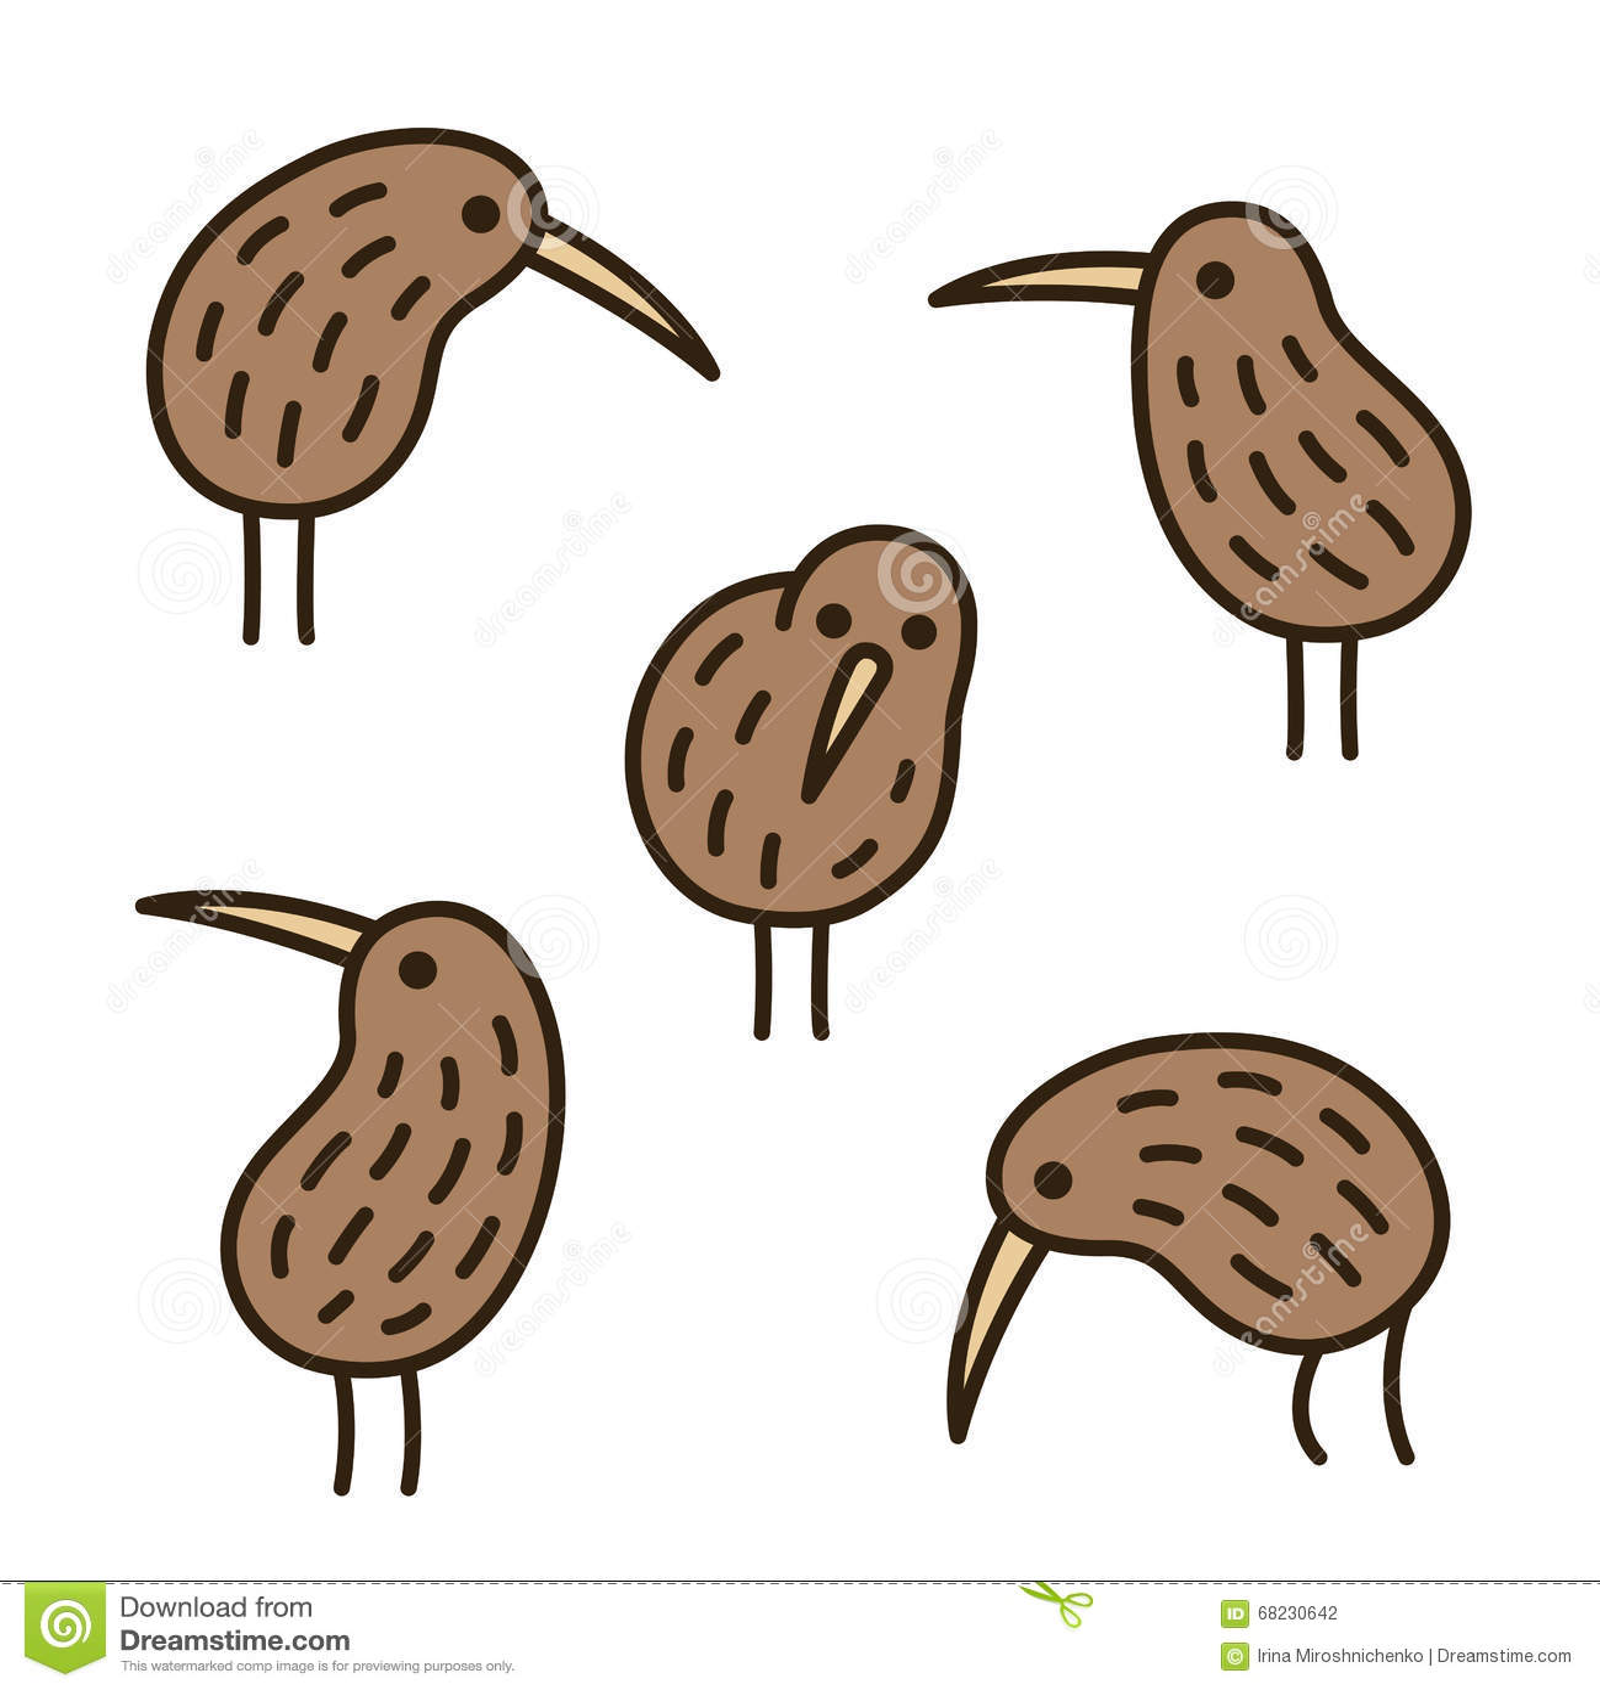 Kiwi Birds Doodle Set Stock Vector Illustration Of Hand 68230642